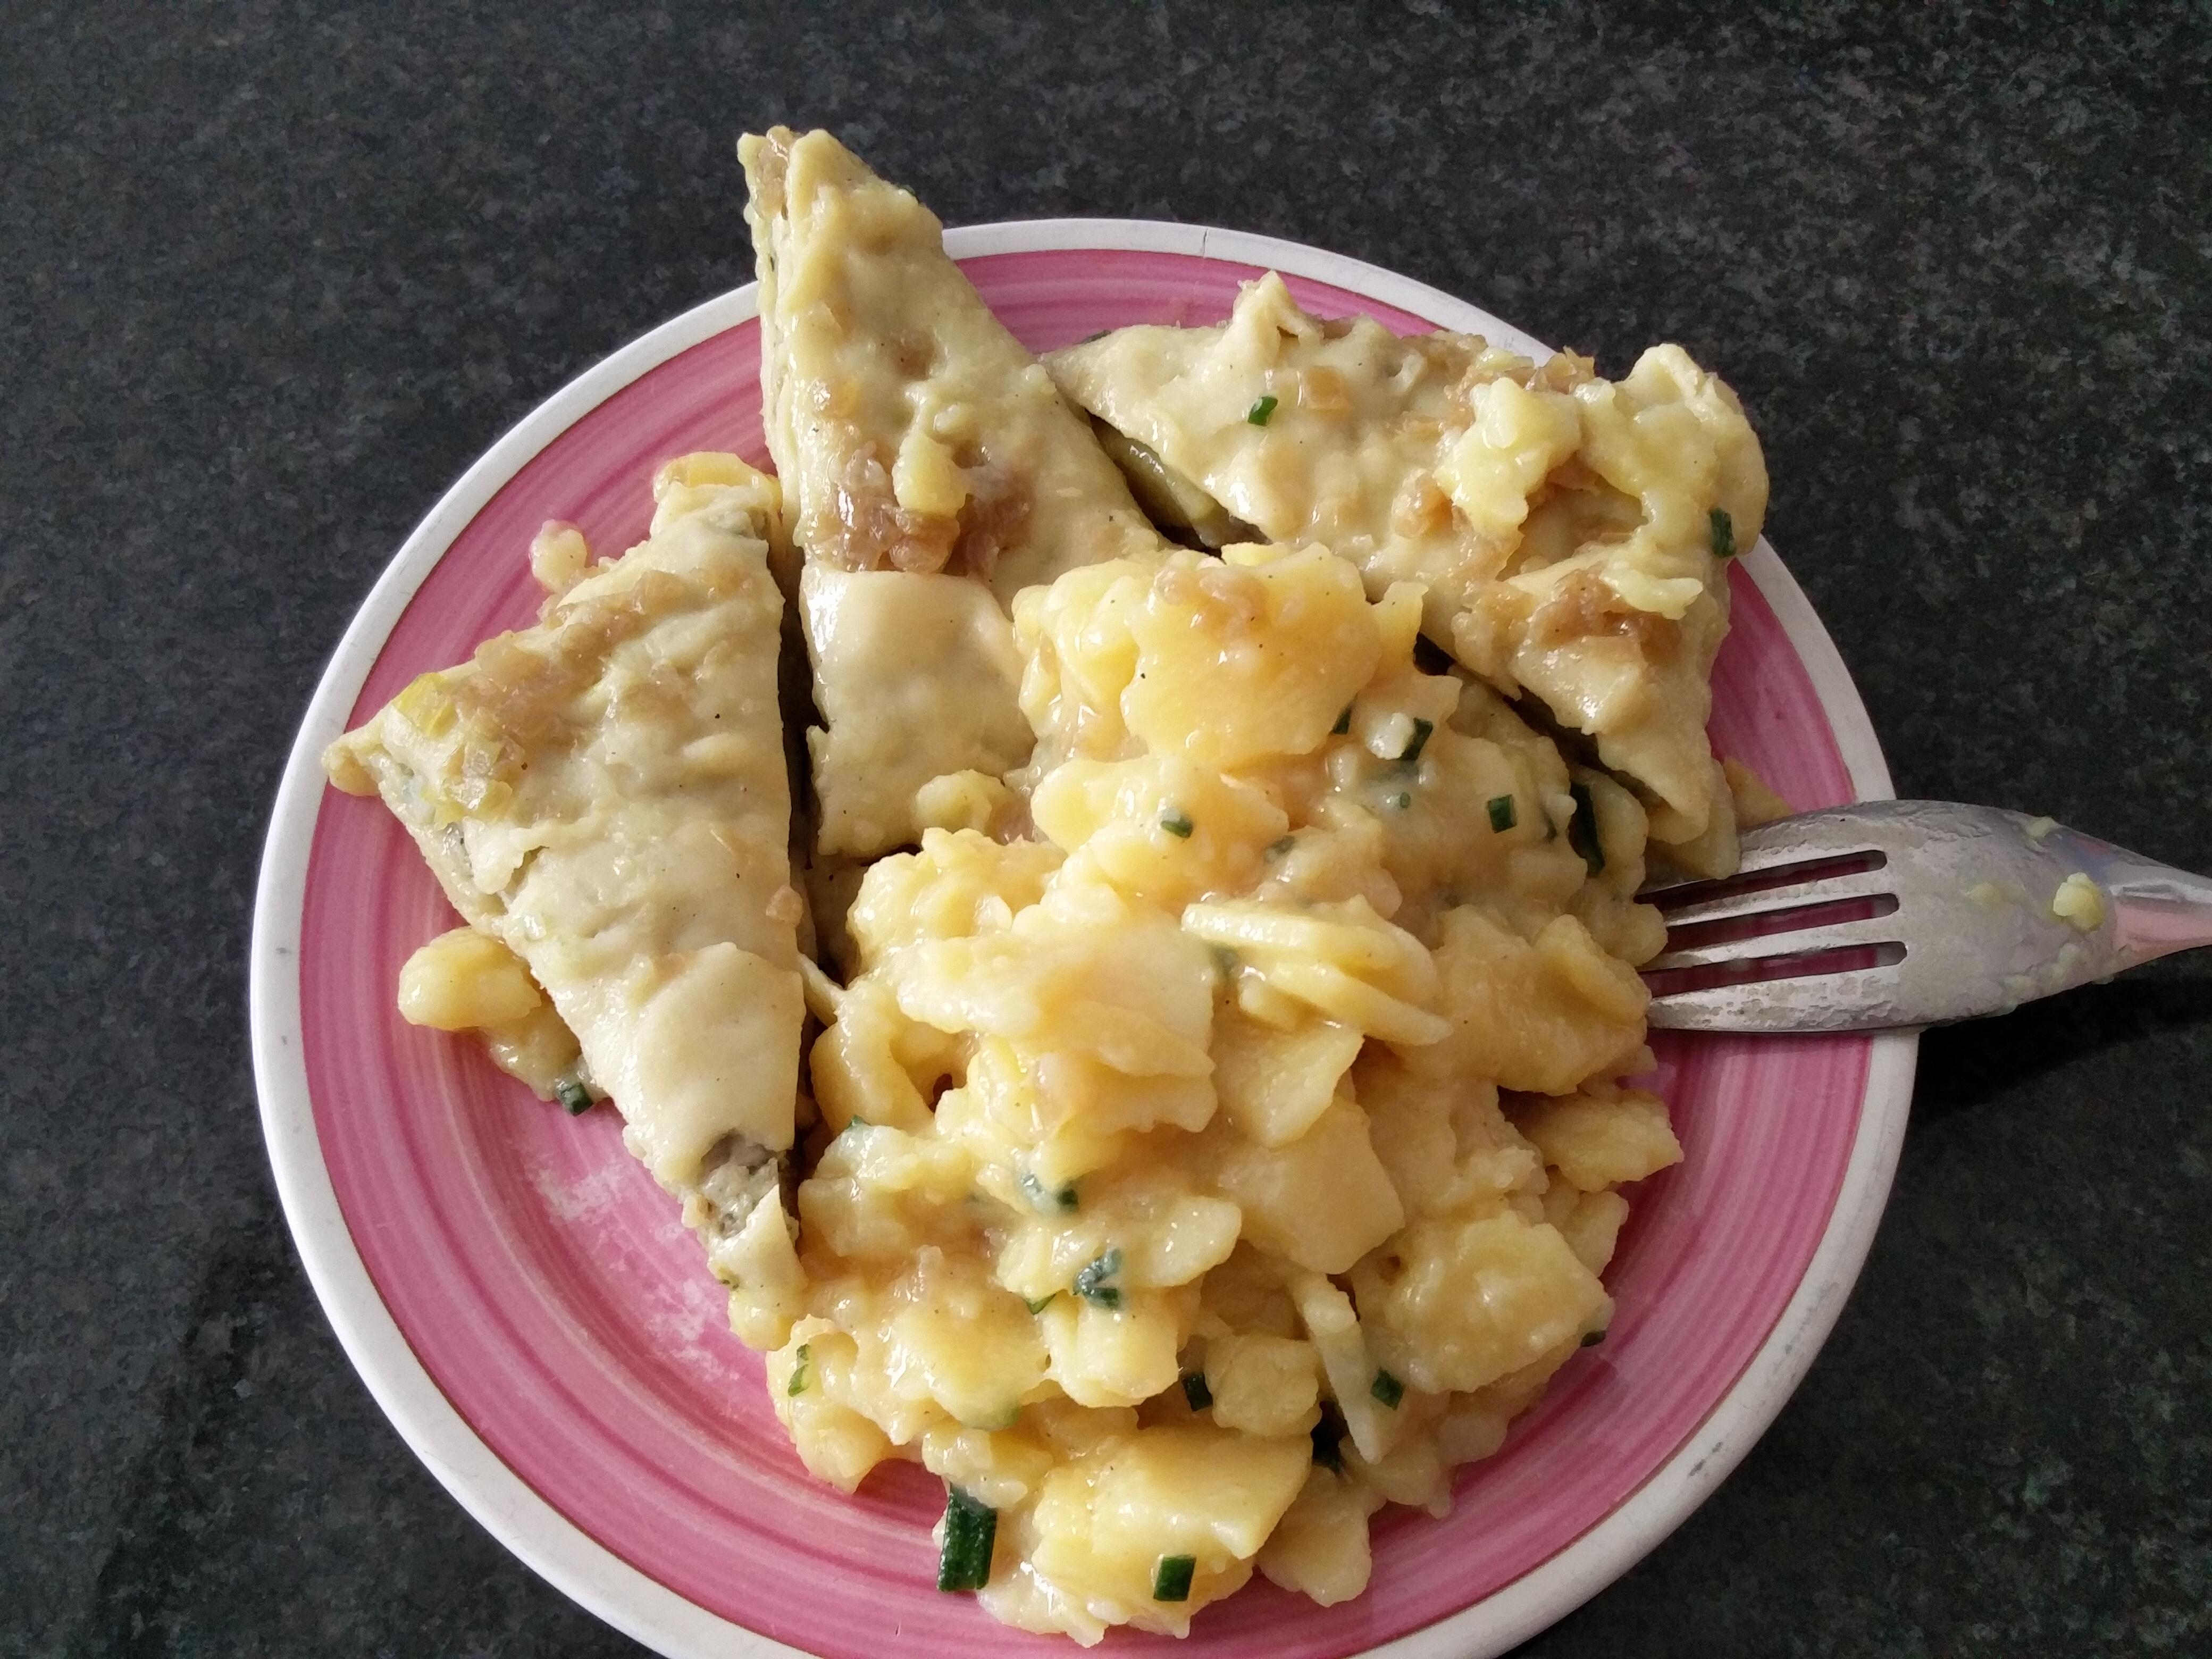 https://foodloader.net/nico_2016-09-25_maultaschen-mit-kartoffelsalat.jpg